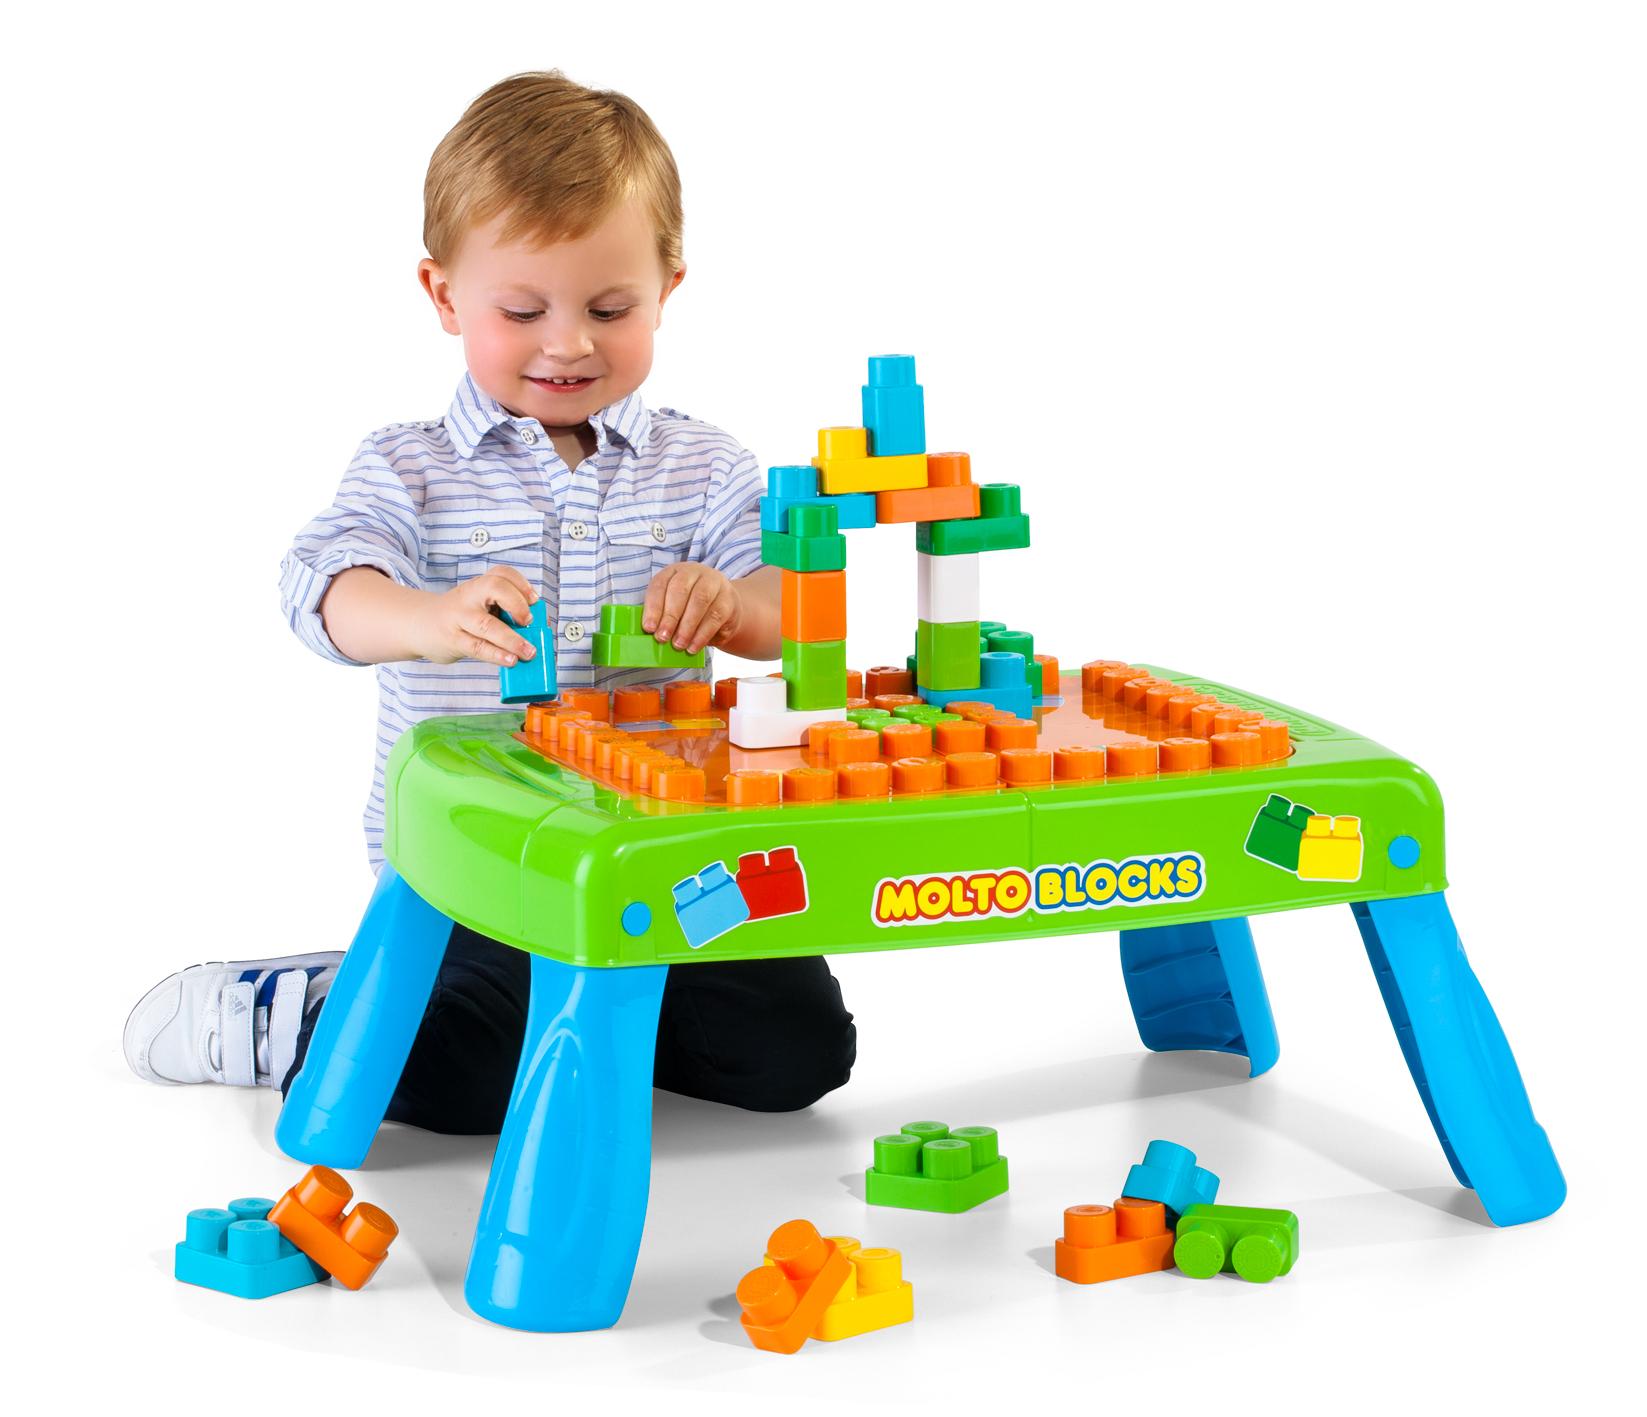 table blocks  u2022 molto  u00b7 juguetes y puericultura